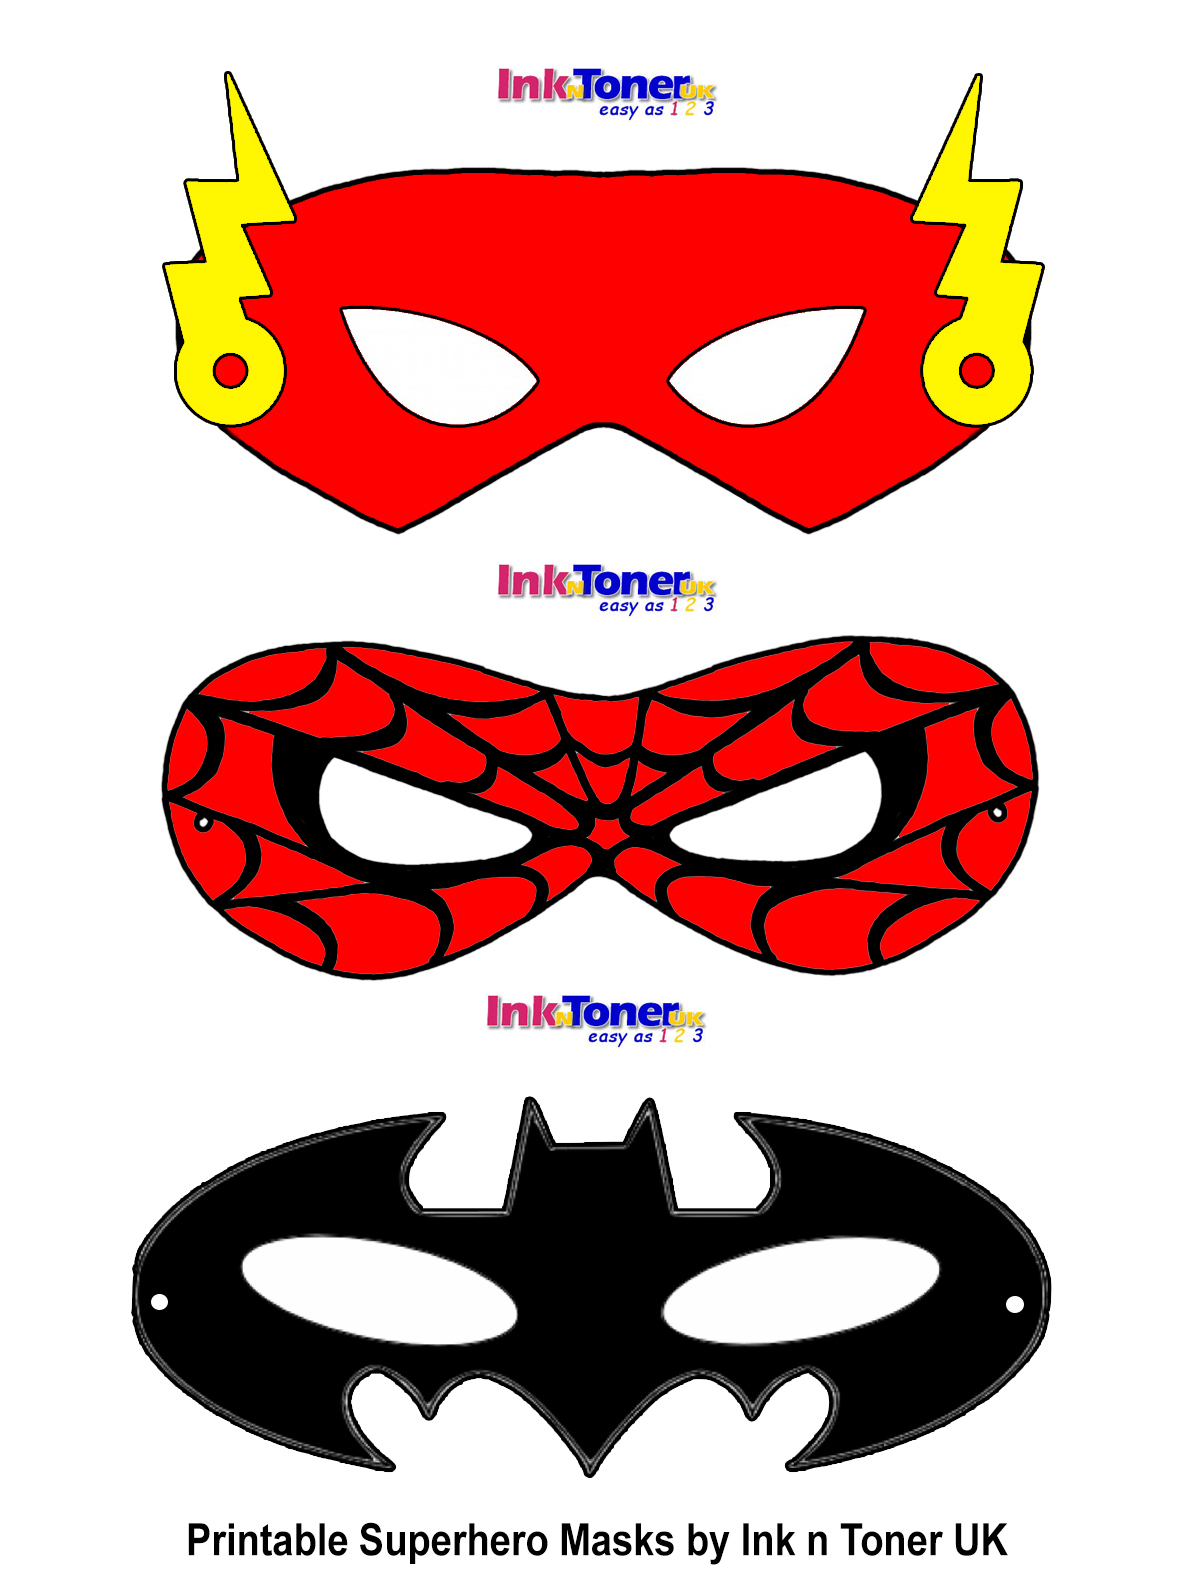 Printable Superhero Masks For Super Hero Day | Inkntoneruk Blog - Superman Mask Printable Free